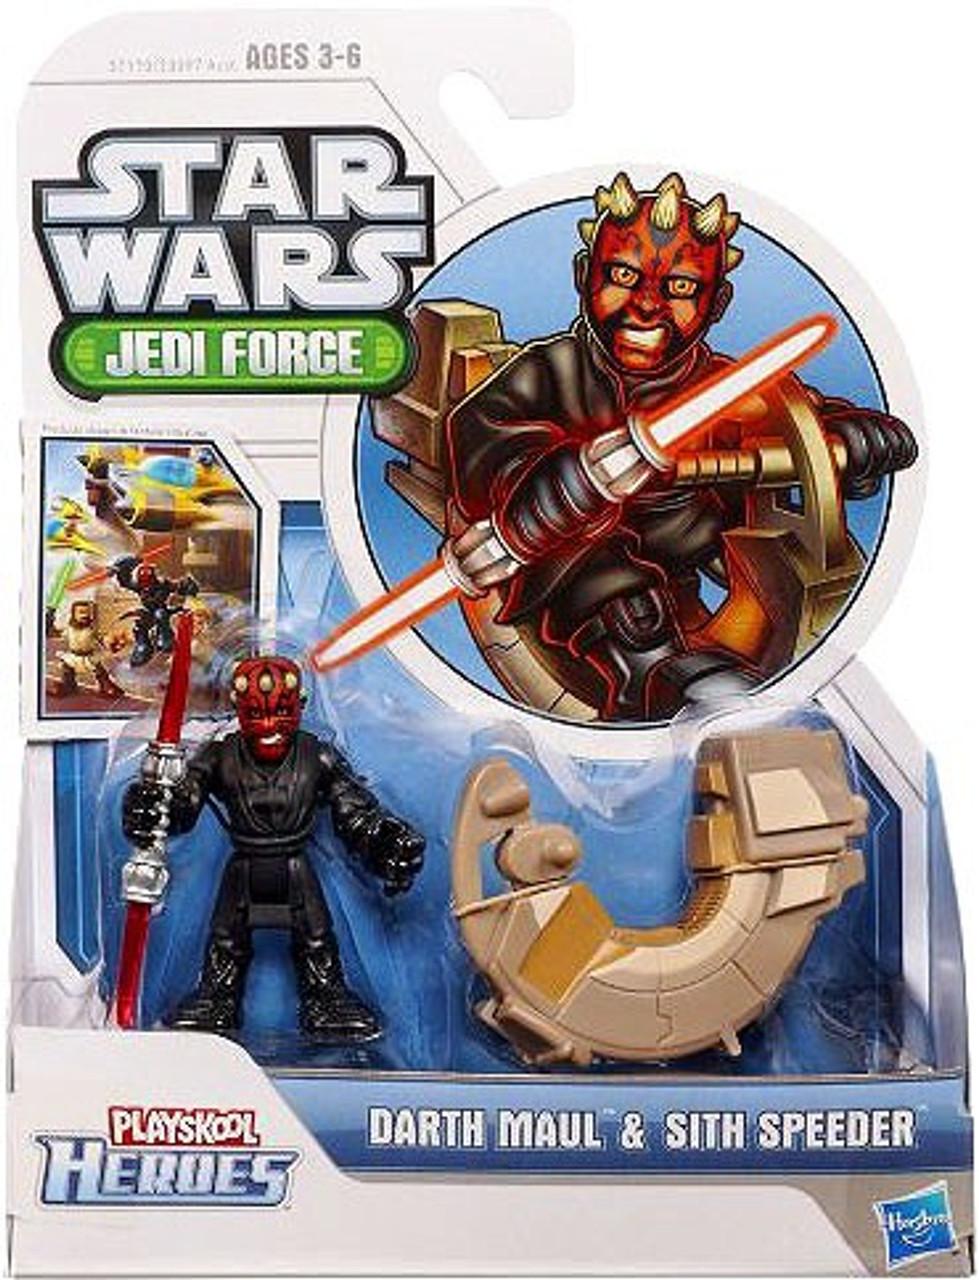 Star Wars Jedi Force Darth Maul & Sith Speeder Mini Figure 2-Pack